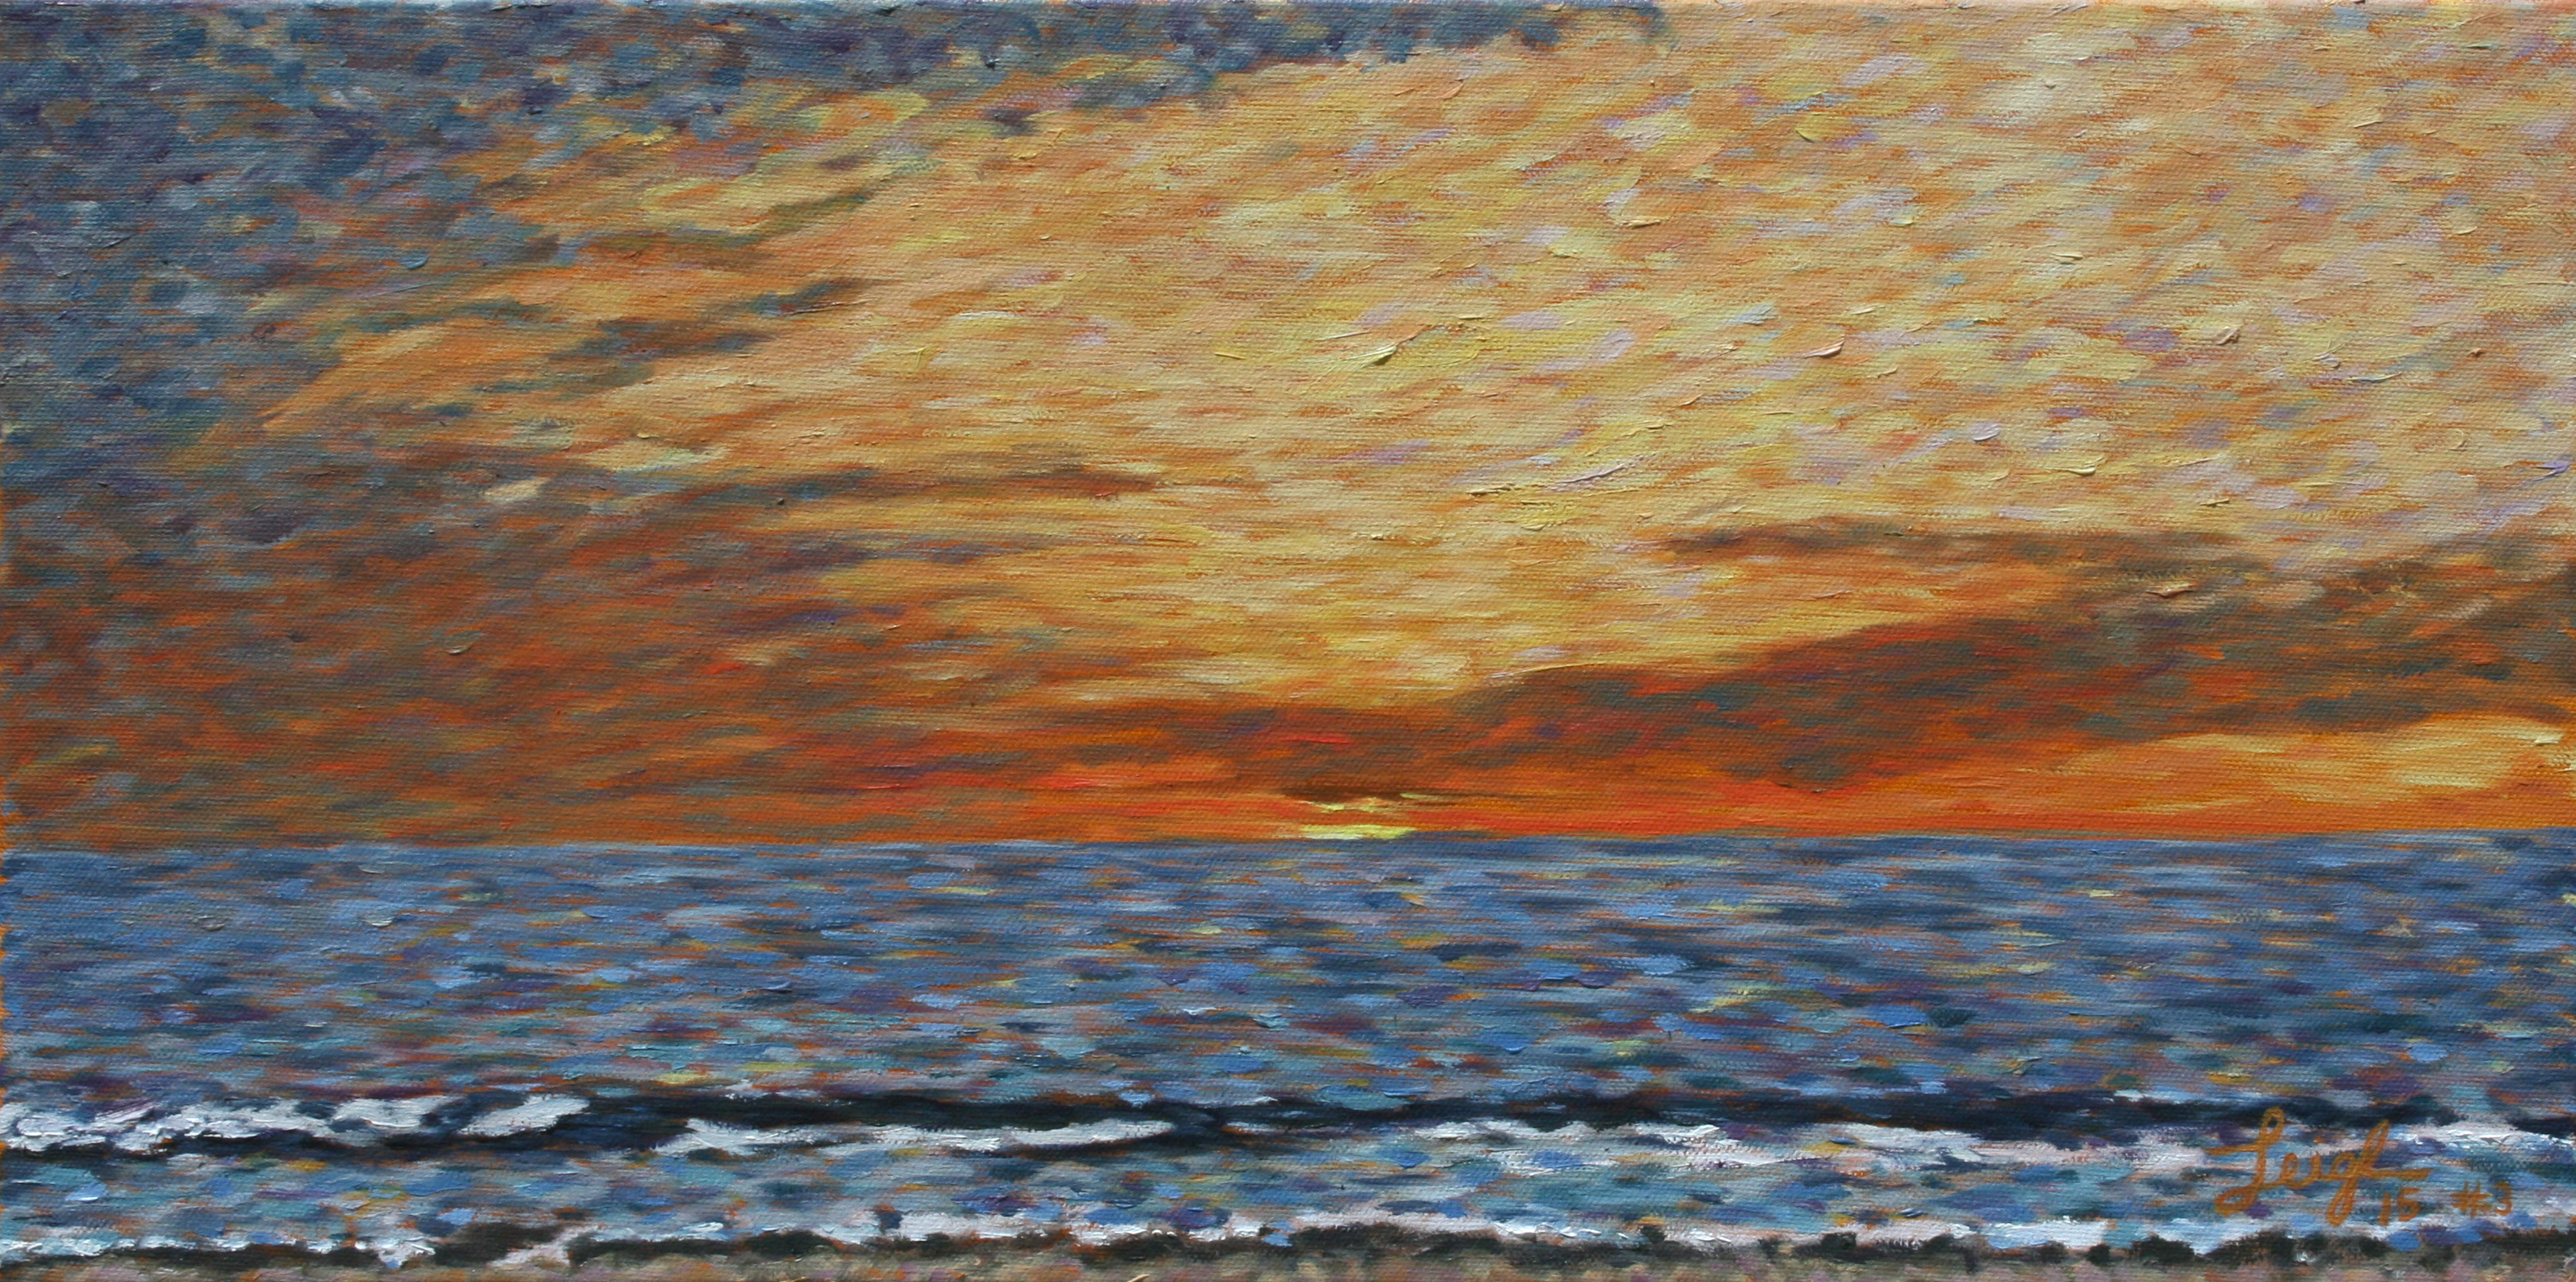 Sunset 2015 #3  ~   Leslie Anderson La Jolla, CA 2015 • 12 x 24